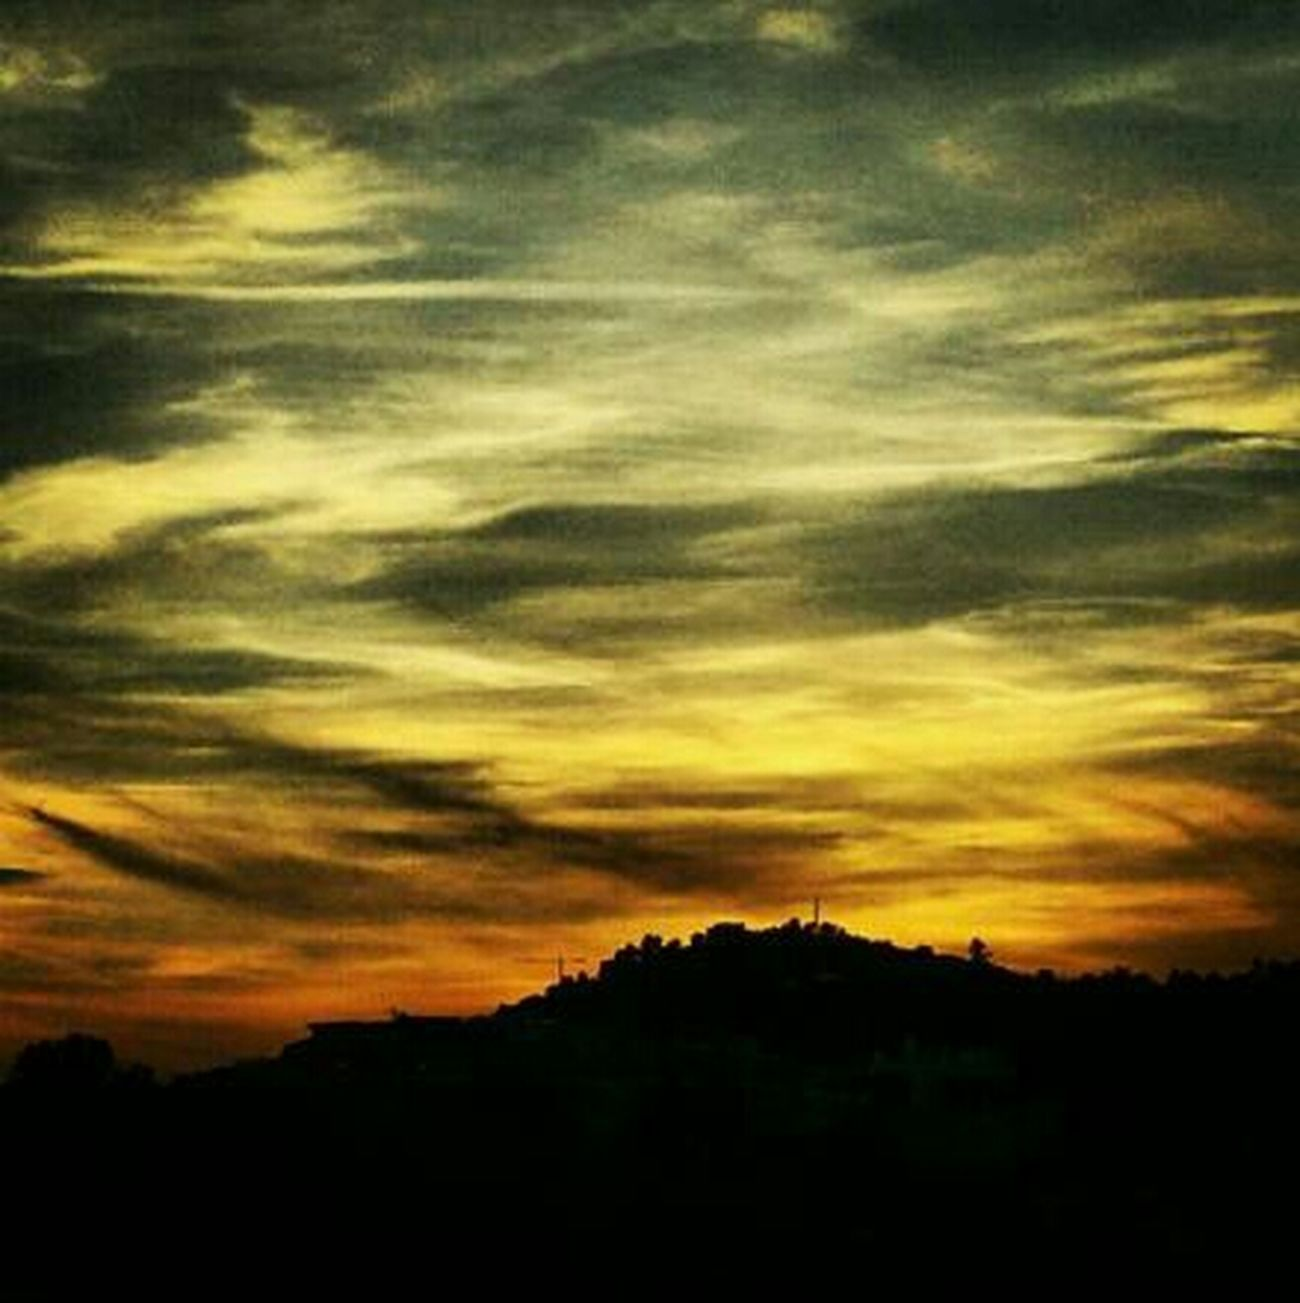 Sky Sol Posta De Sol Movilgrafias Cel Nubols Muntanya 1001_styles